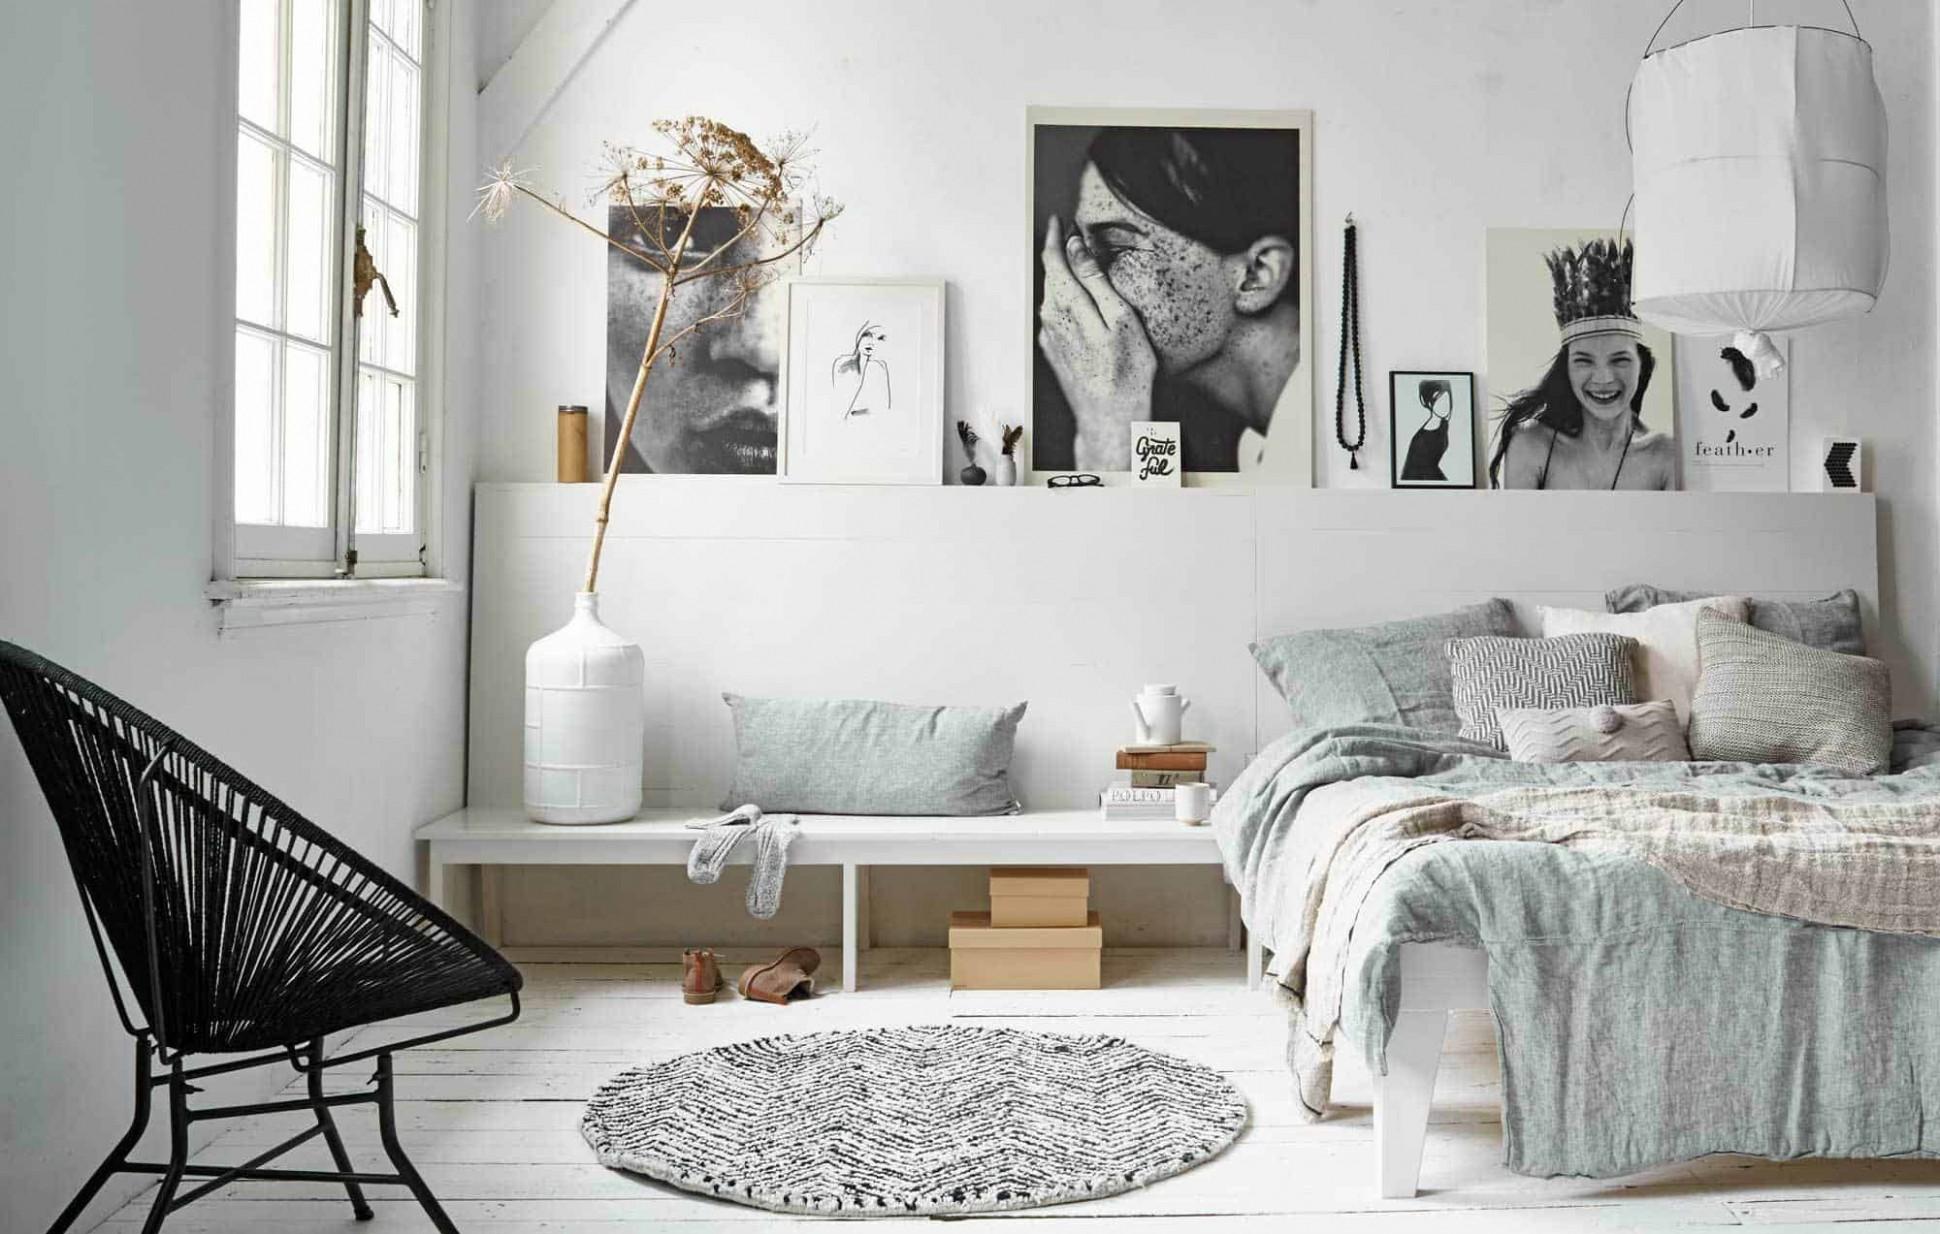 11 Amazing solutions for bedroom headboard alternatives - Bedroom Ideas Without Headboard